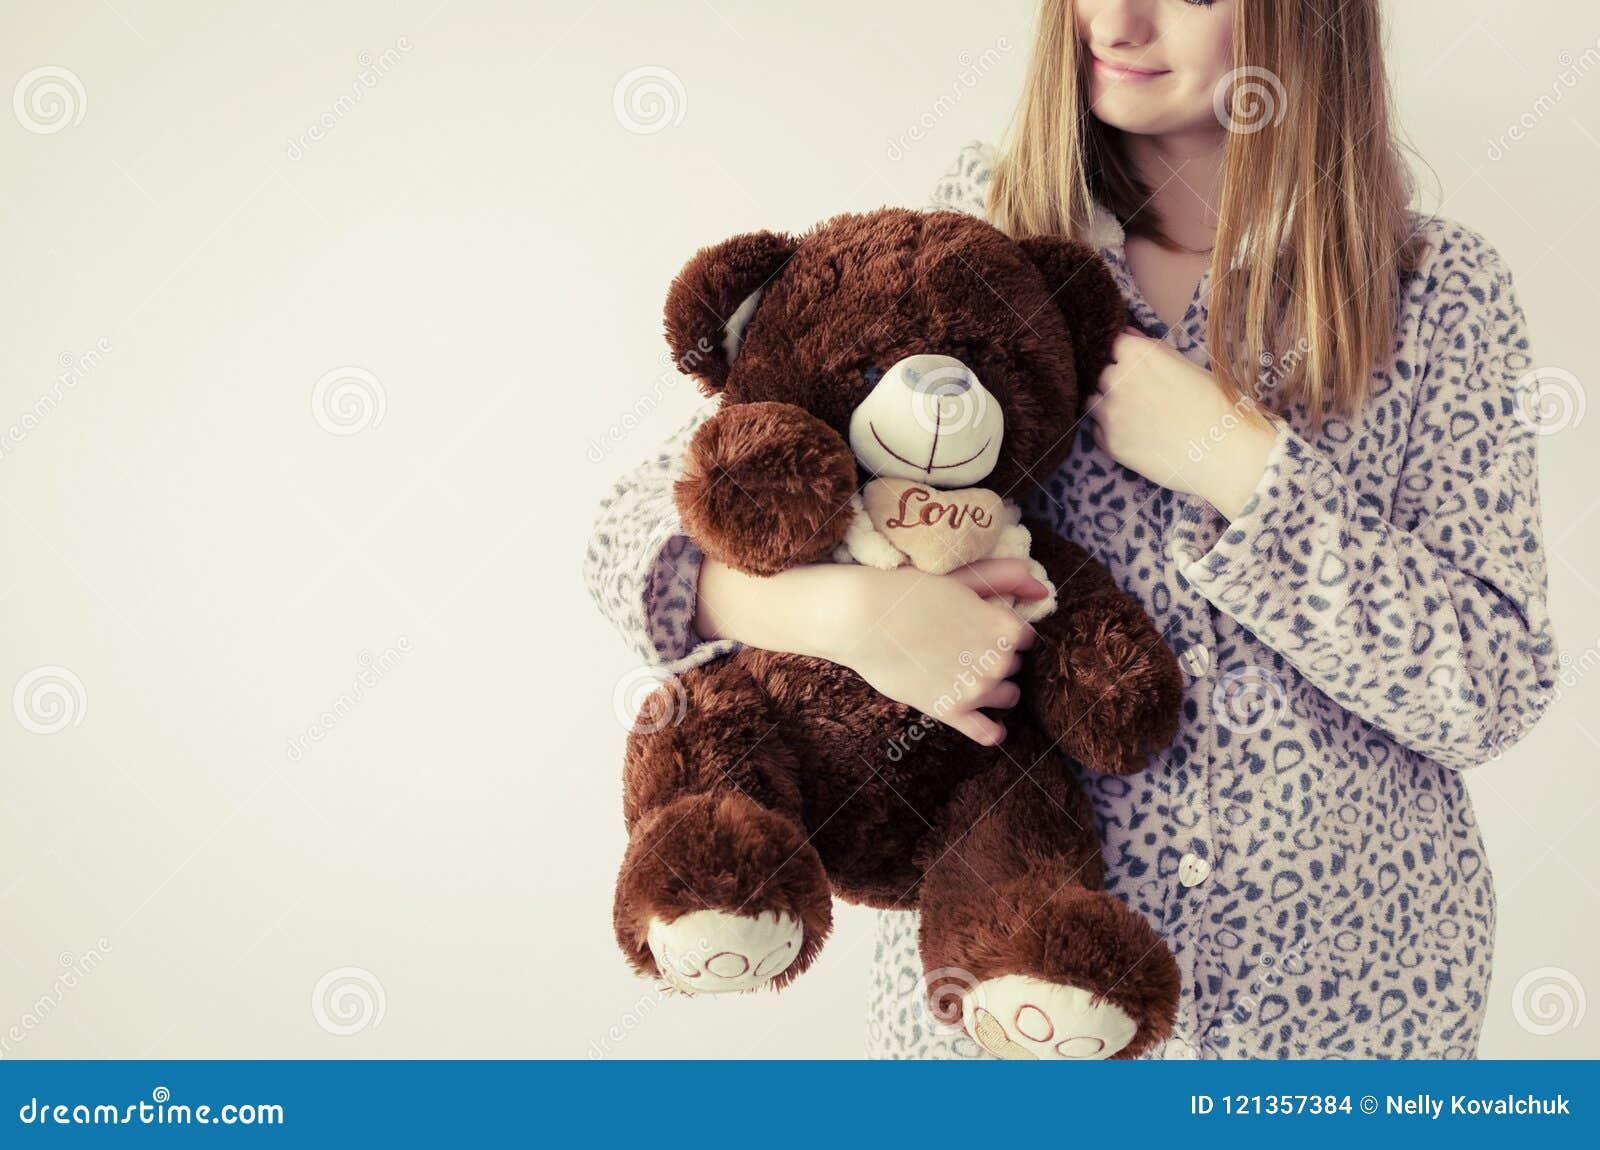 girls Stuffed teen